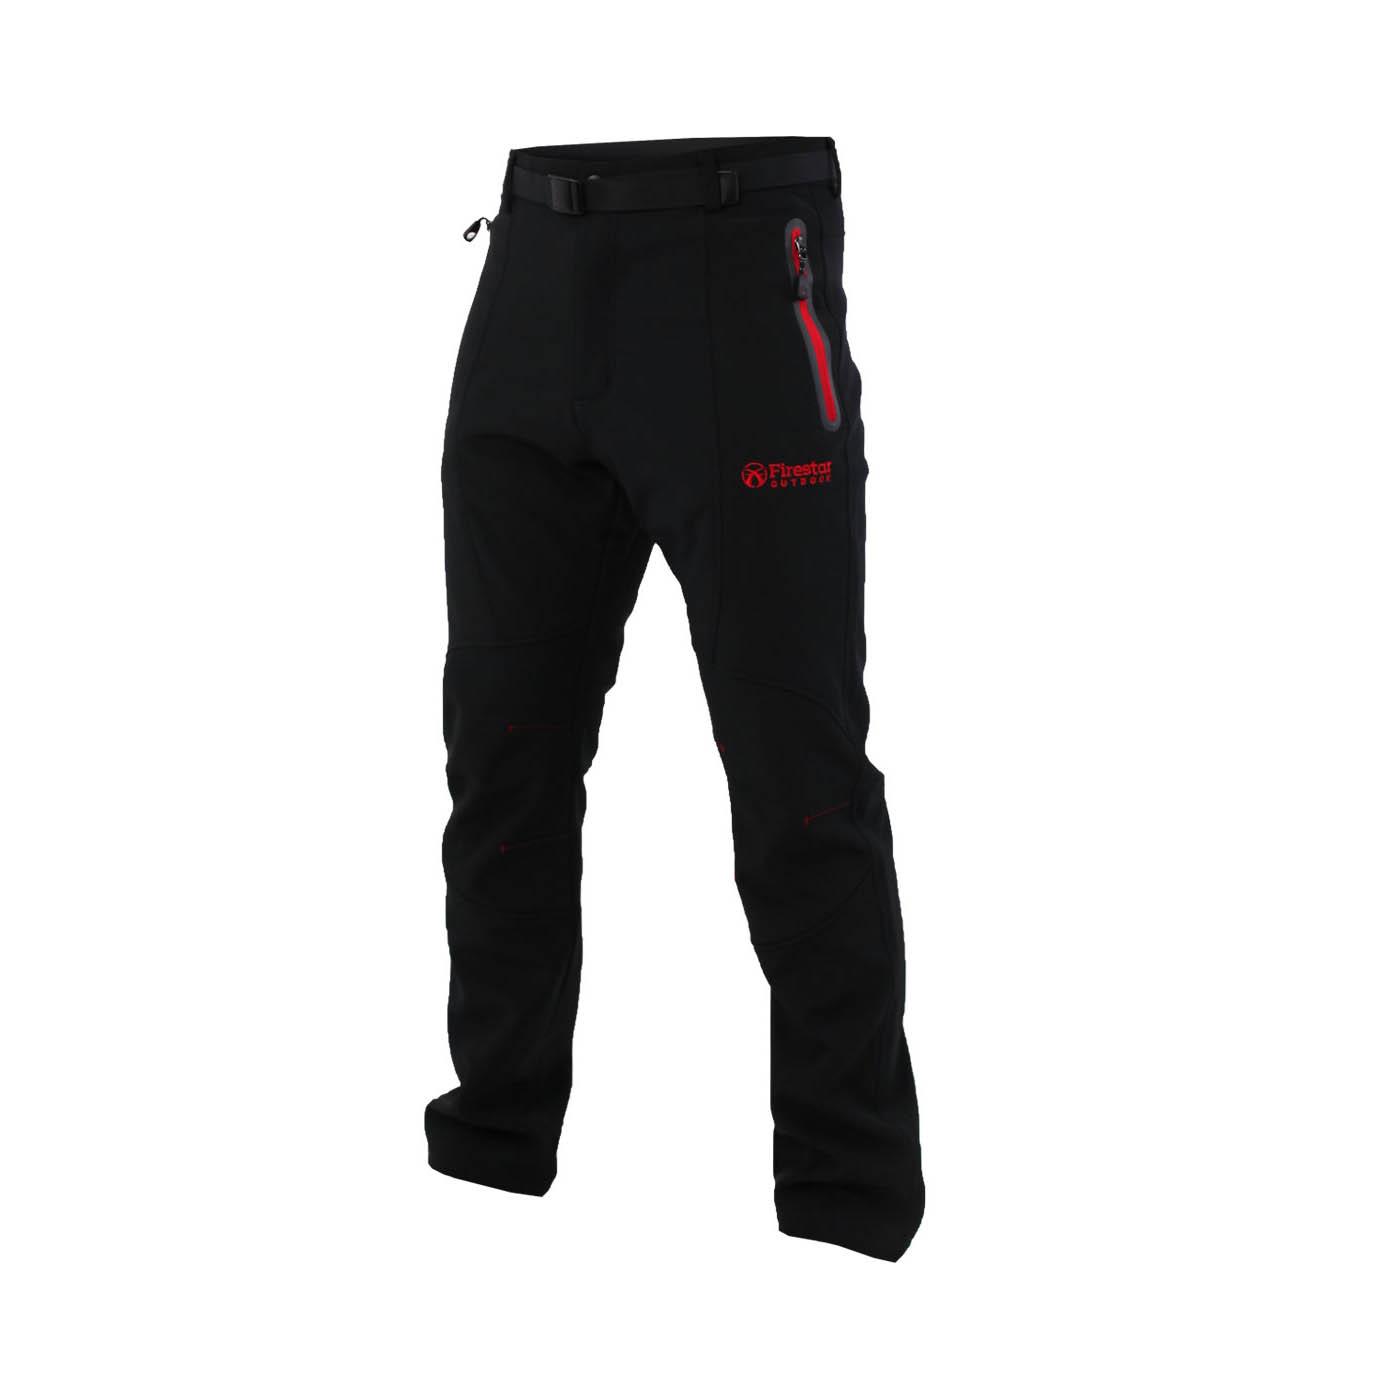 FIRESTAR 男款彈性平織磨毛裏長褲 P6573-40 - 黑紅